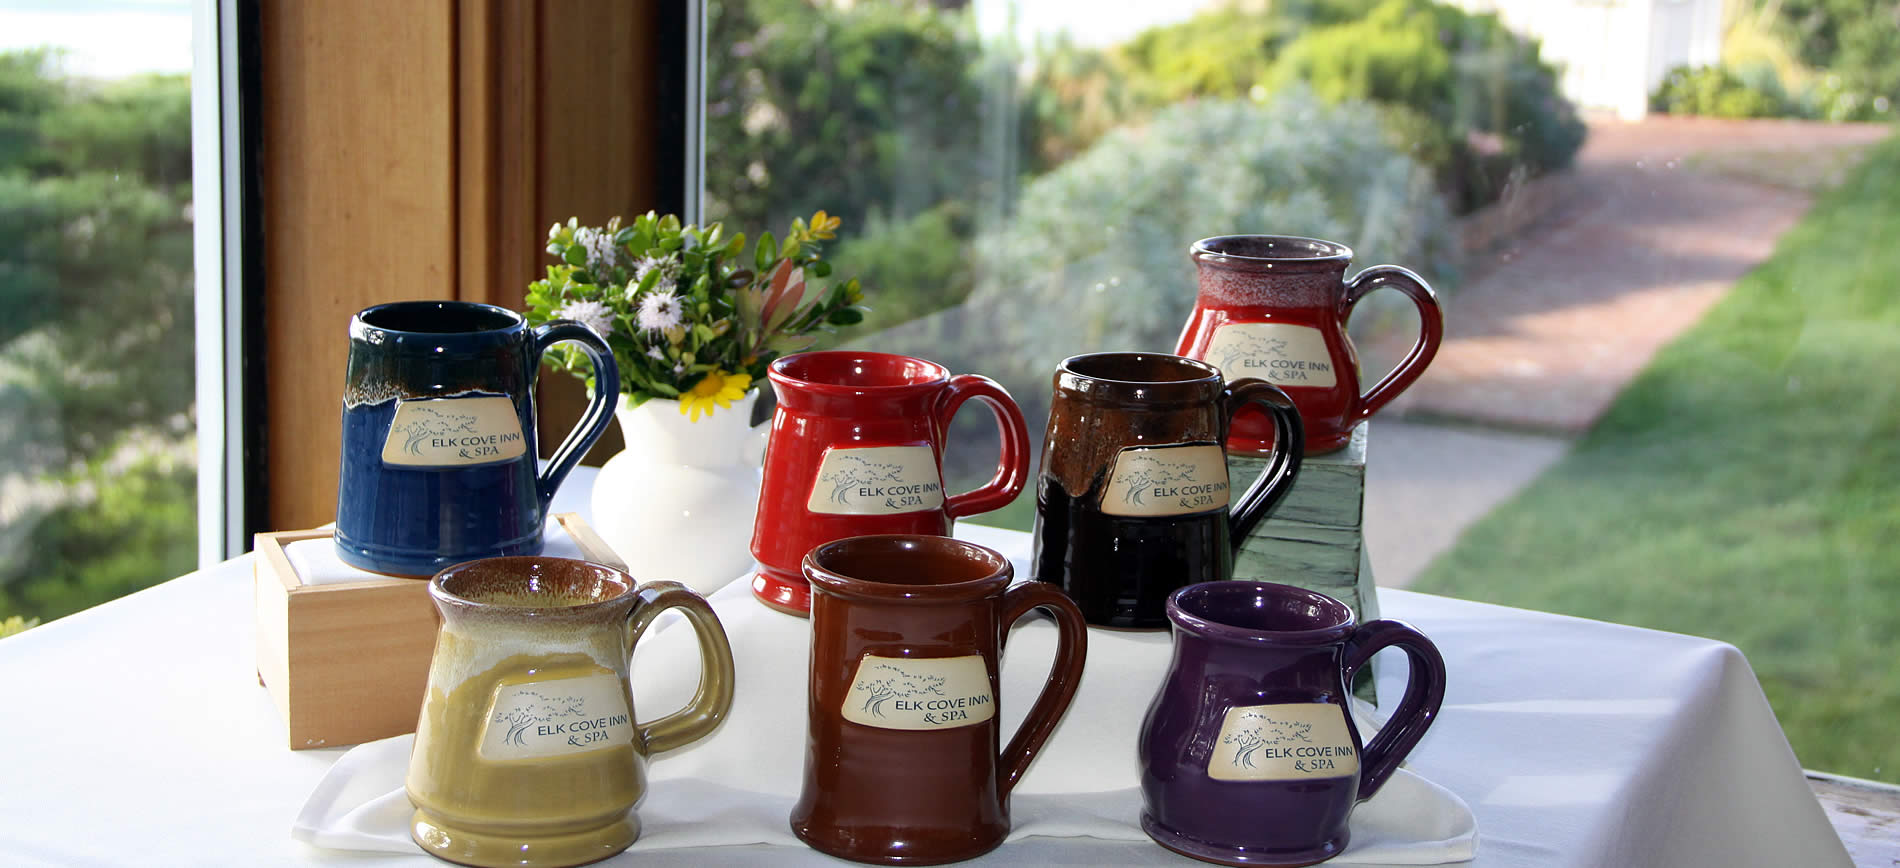 elk cove inn gift shop - mugs